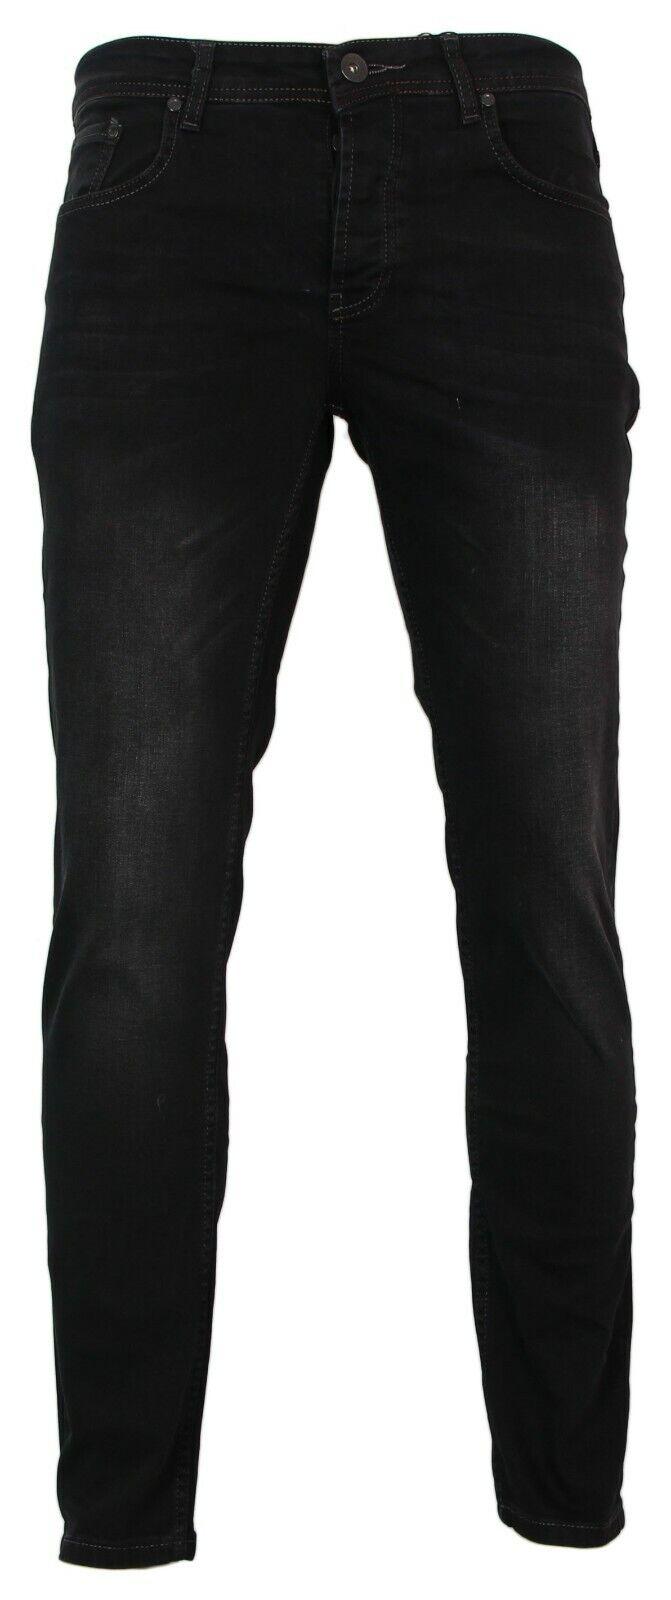 A. S.J Designer Men's Jeans Trousers Regular Slimfit Jeans Trousers